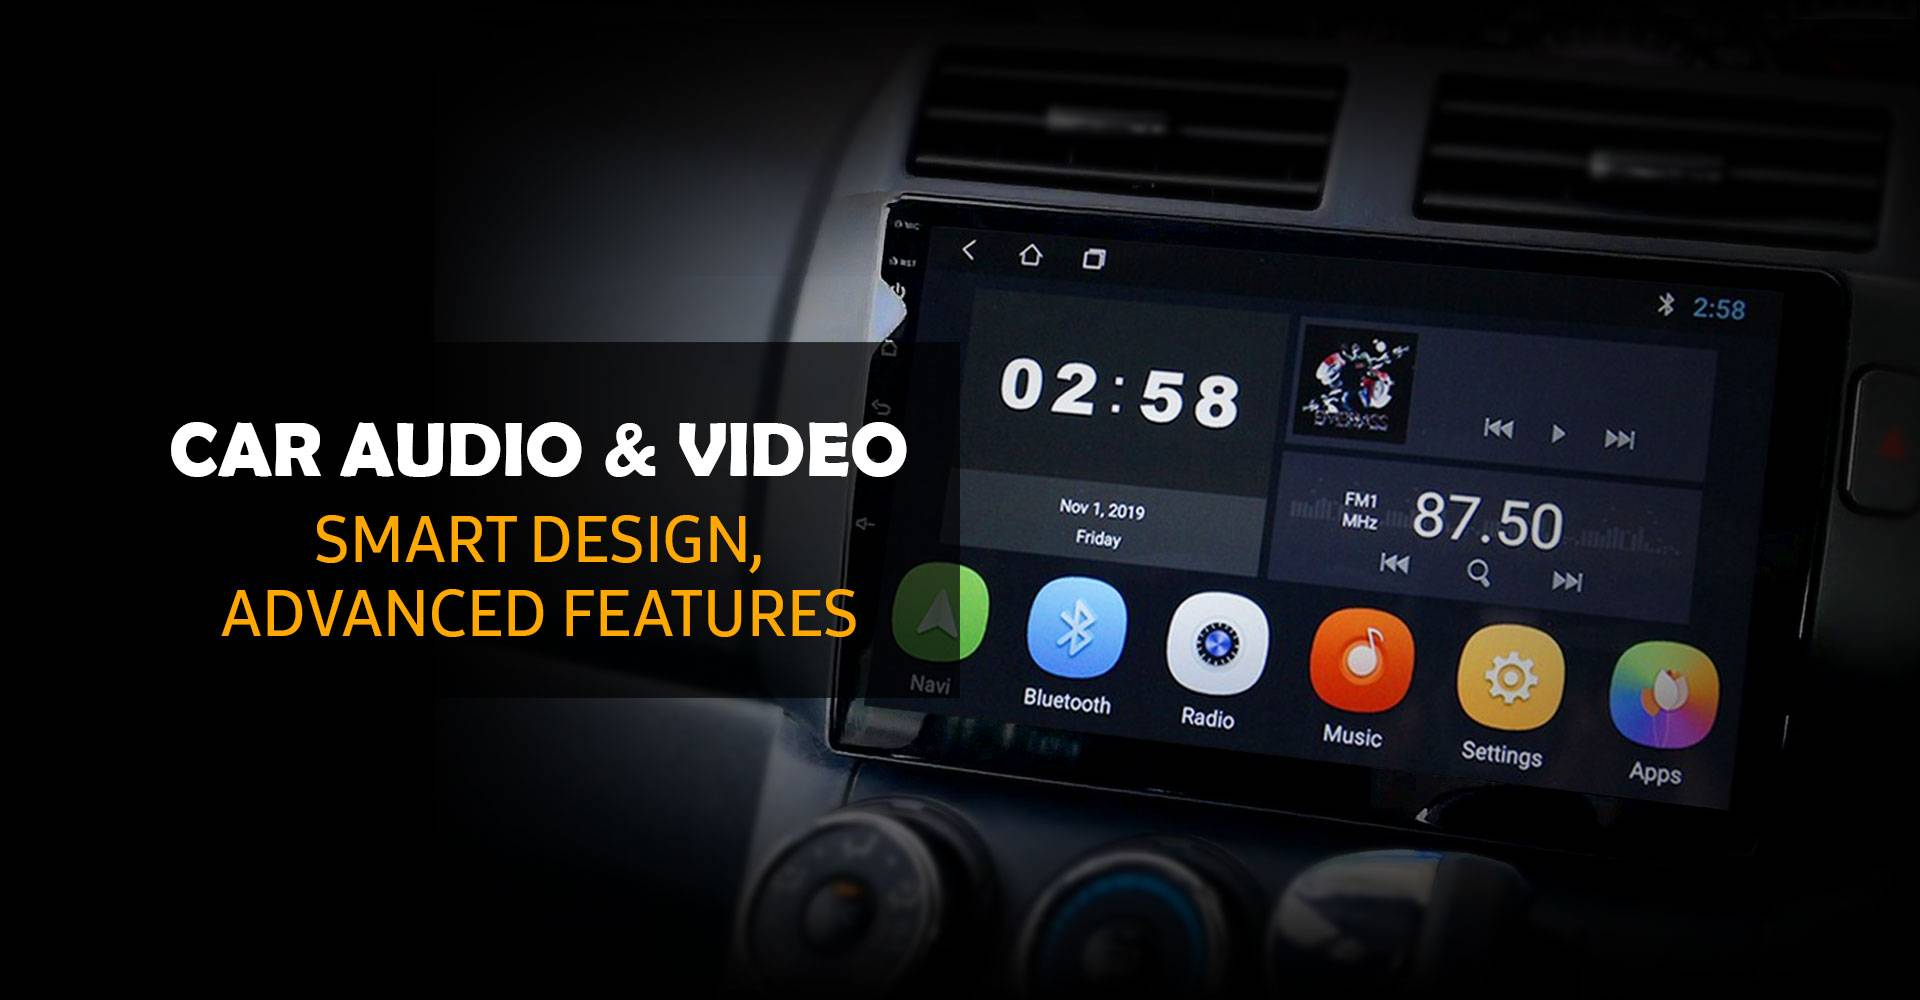 CAR AUDIO & VIDEO SMART DESIGN, ADVANCED FEATURES